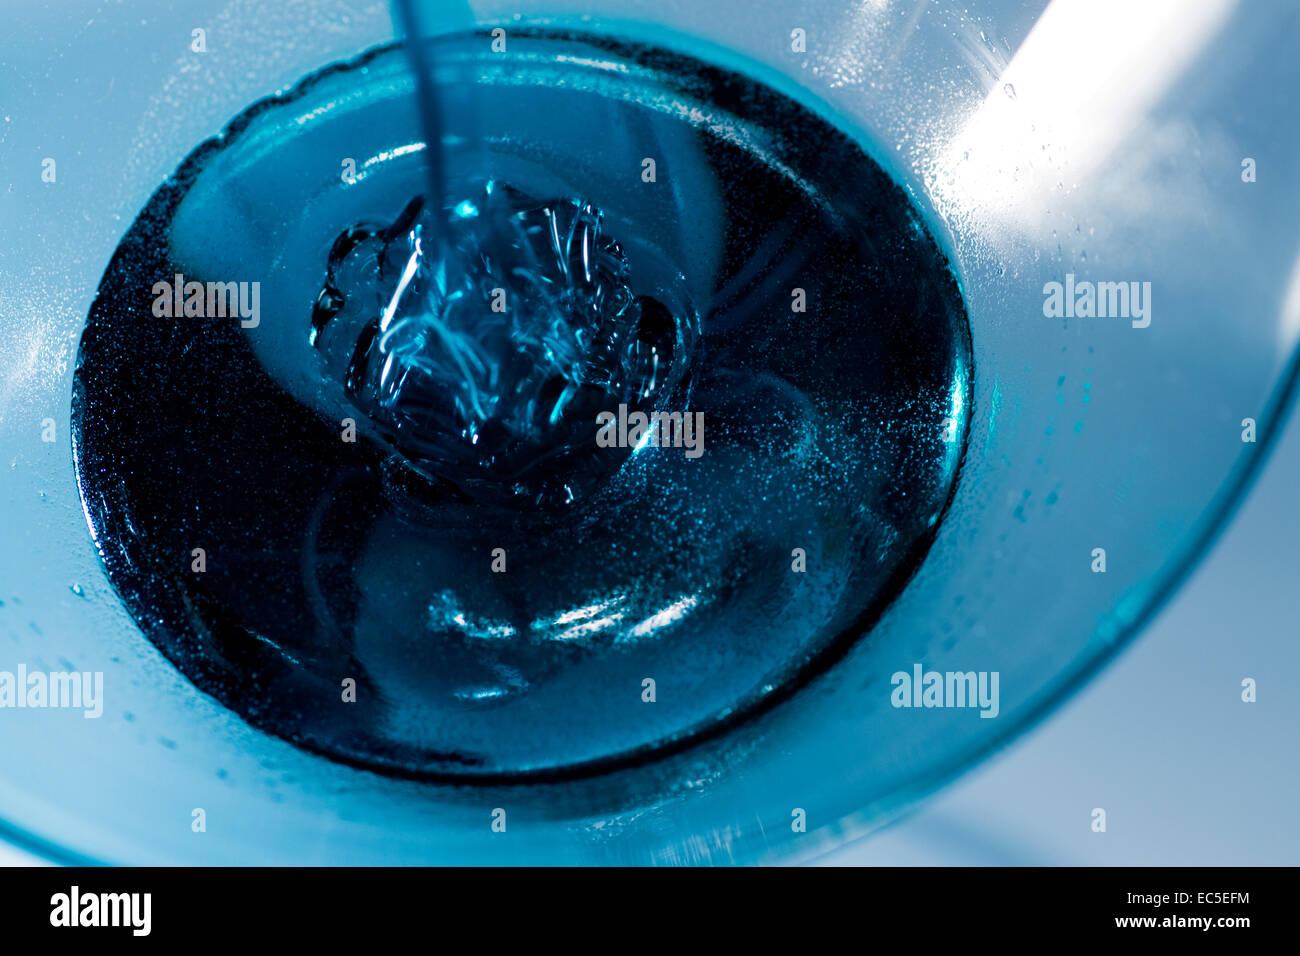 blue liquid in a glass Stock Photo